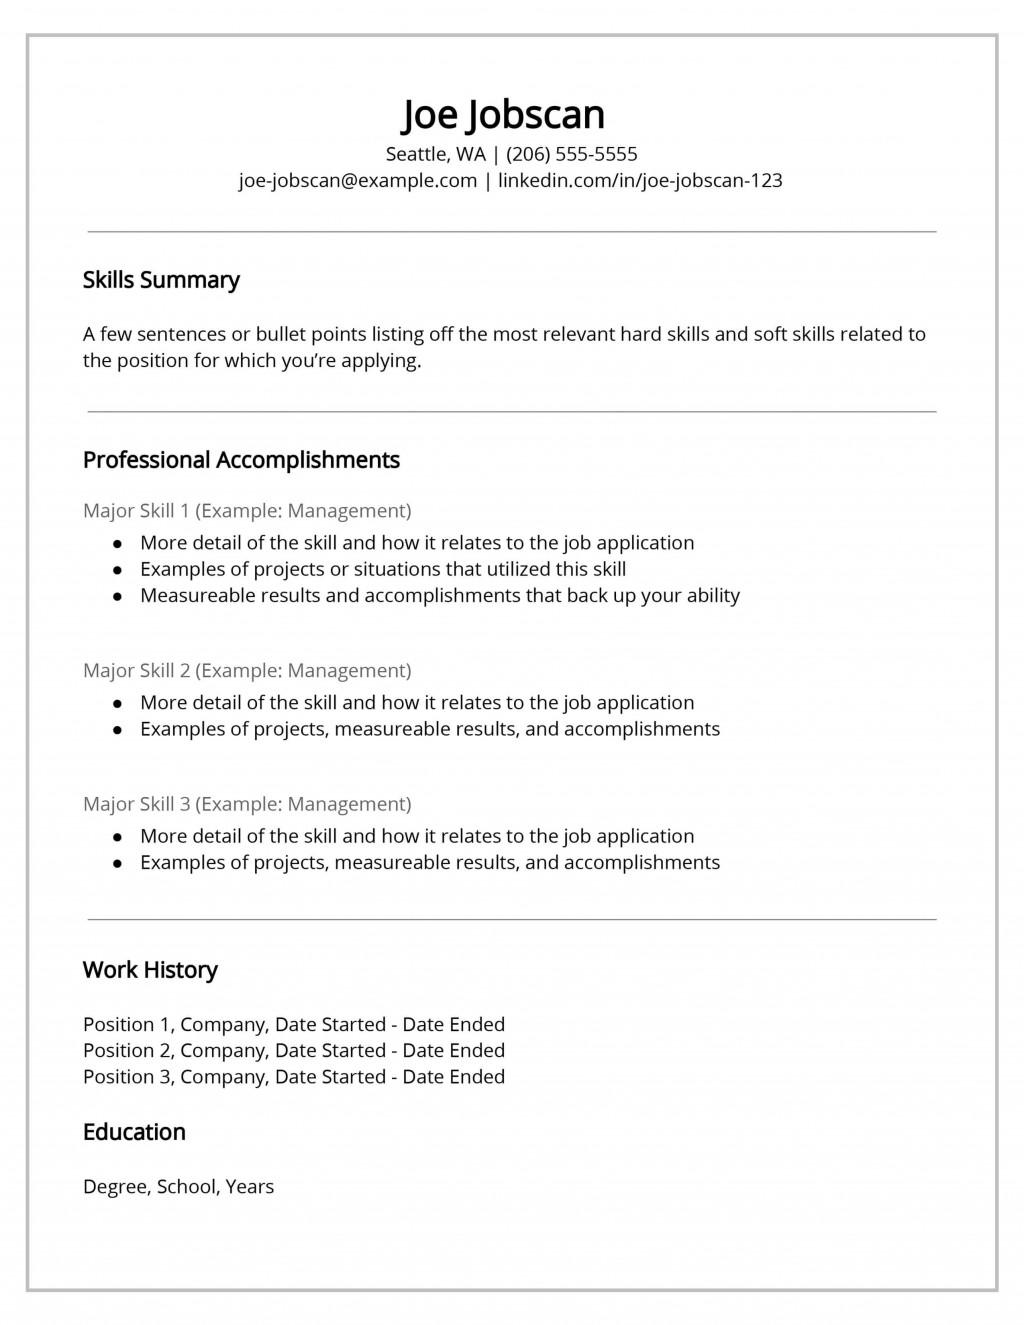 006 Incredible Skill Based Resume Template Word Sample  MicrosoftLarge